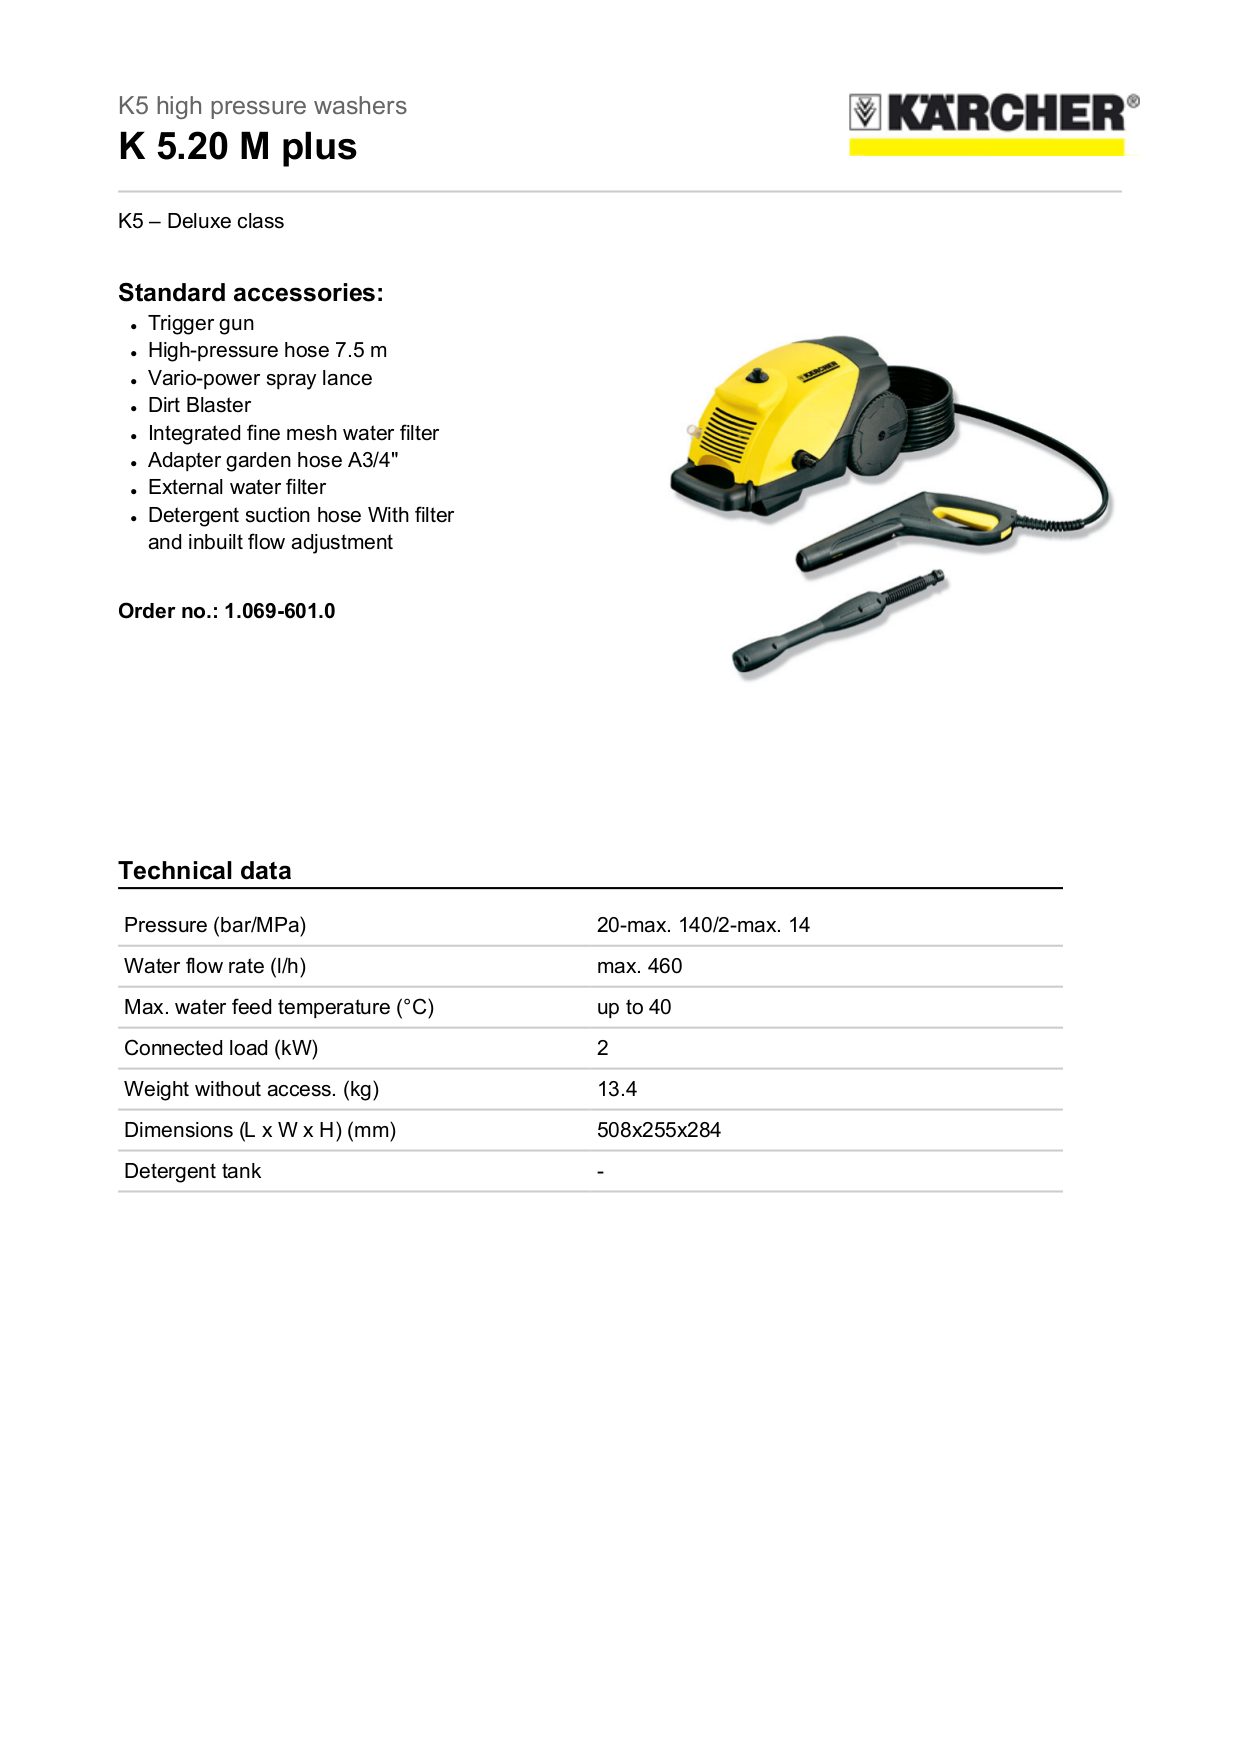 pdf for Karcher Other K 520 M Pressure Washers manual